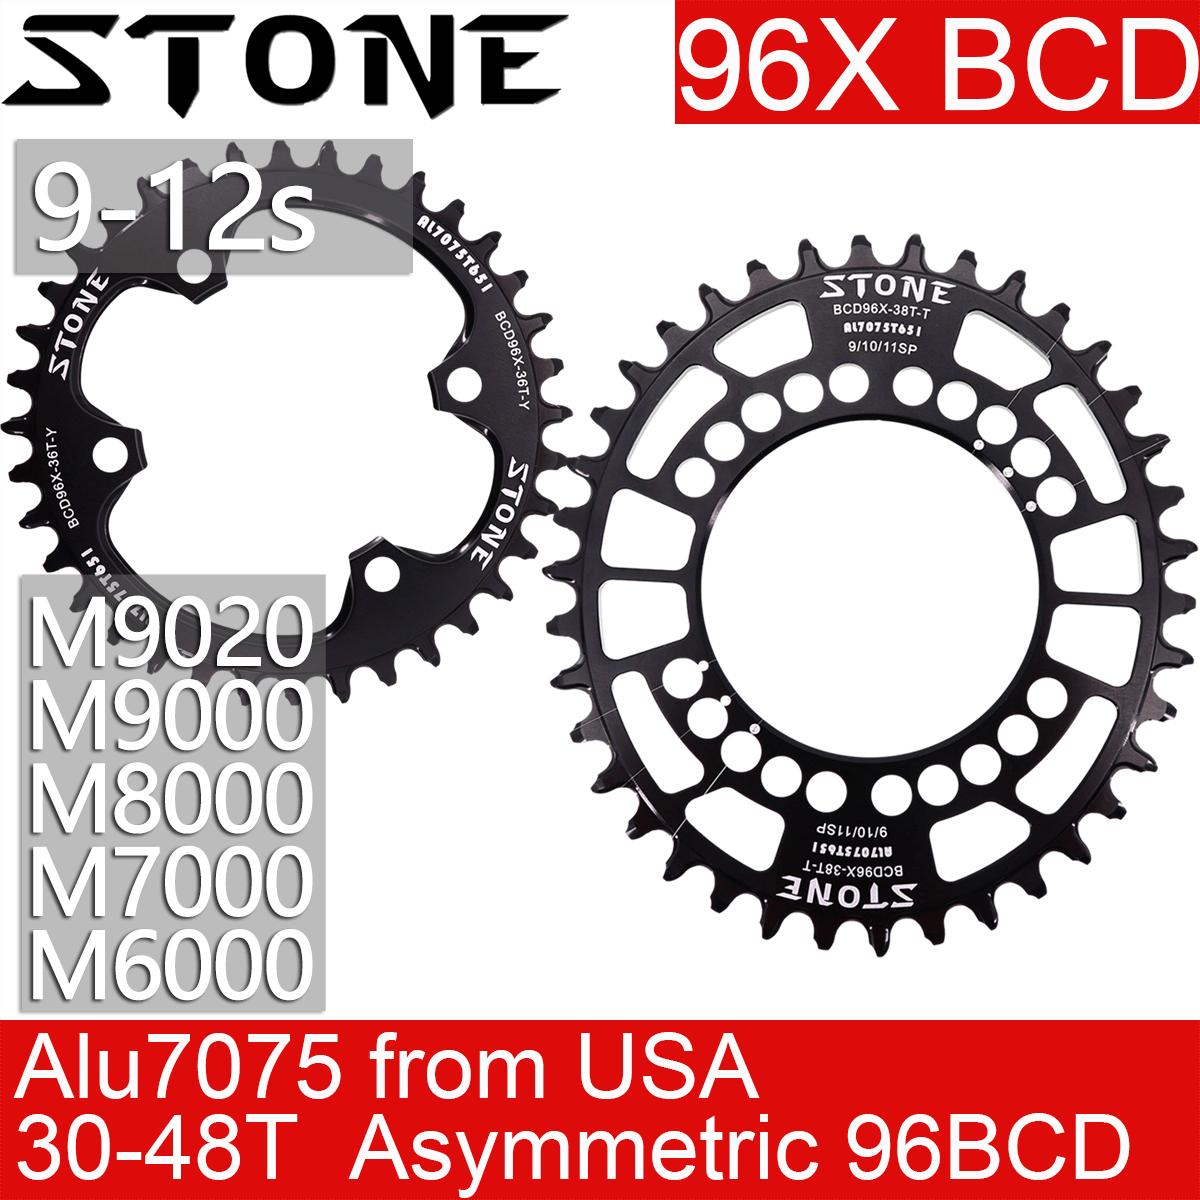 Stone Bike Oval Single Chainring 96BCD For SHIMANO slx M7000 xt M8000 M9000